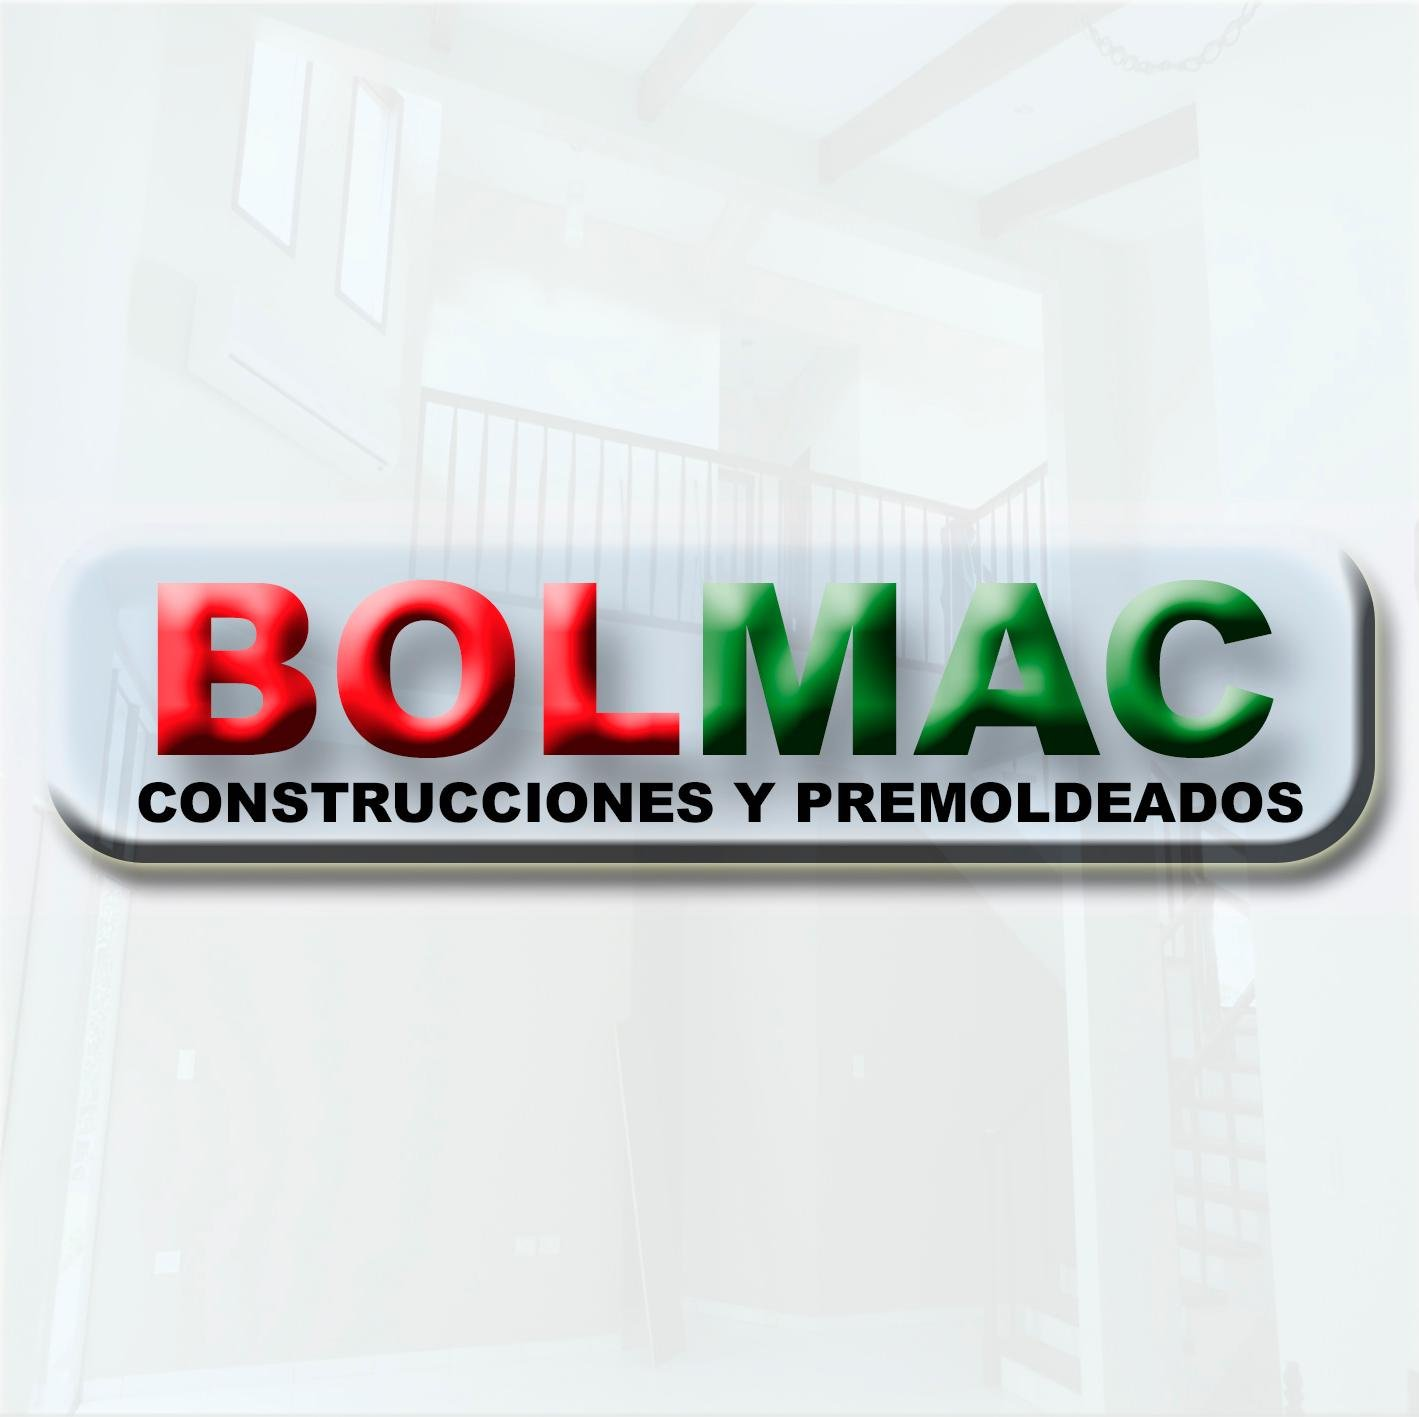 Constructora bolmac constbolmac twitter for Constructora